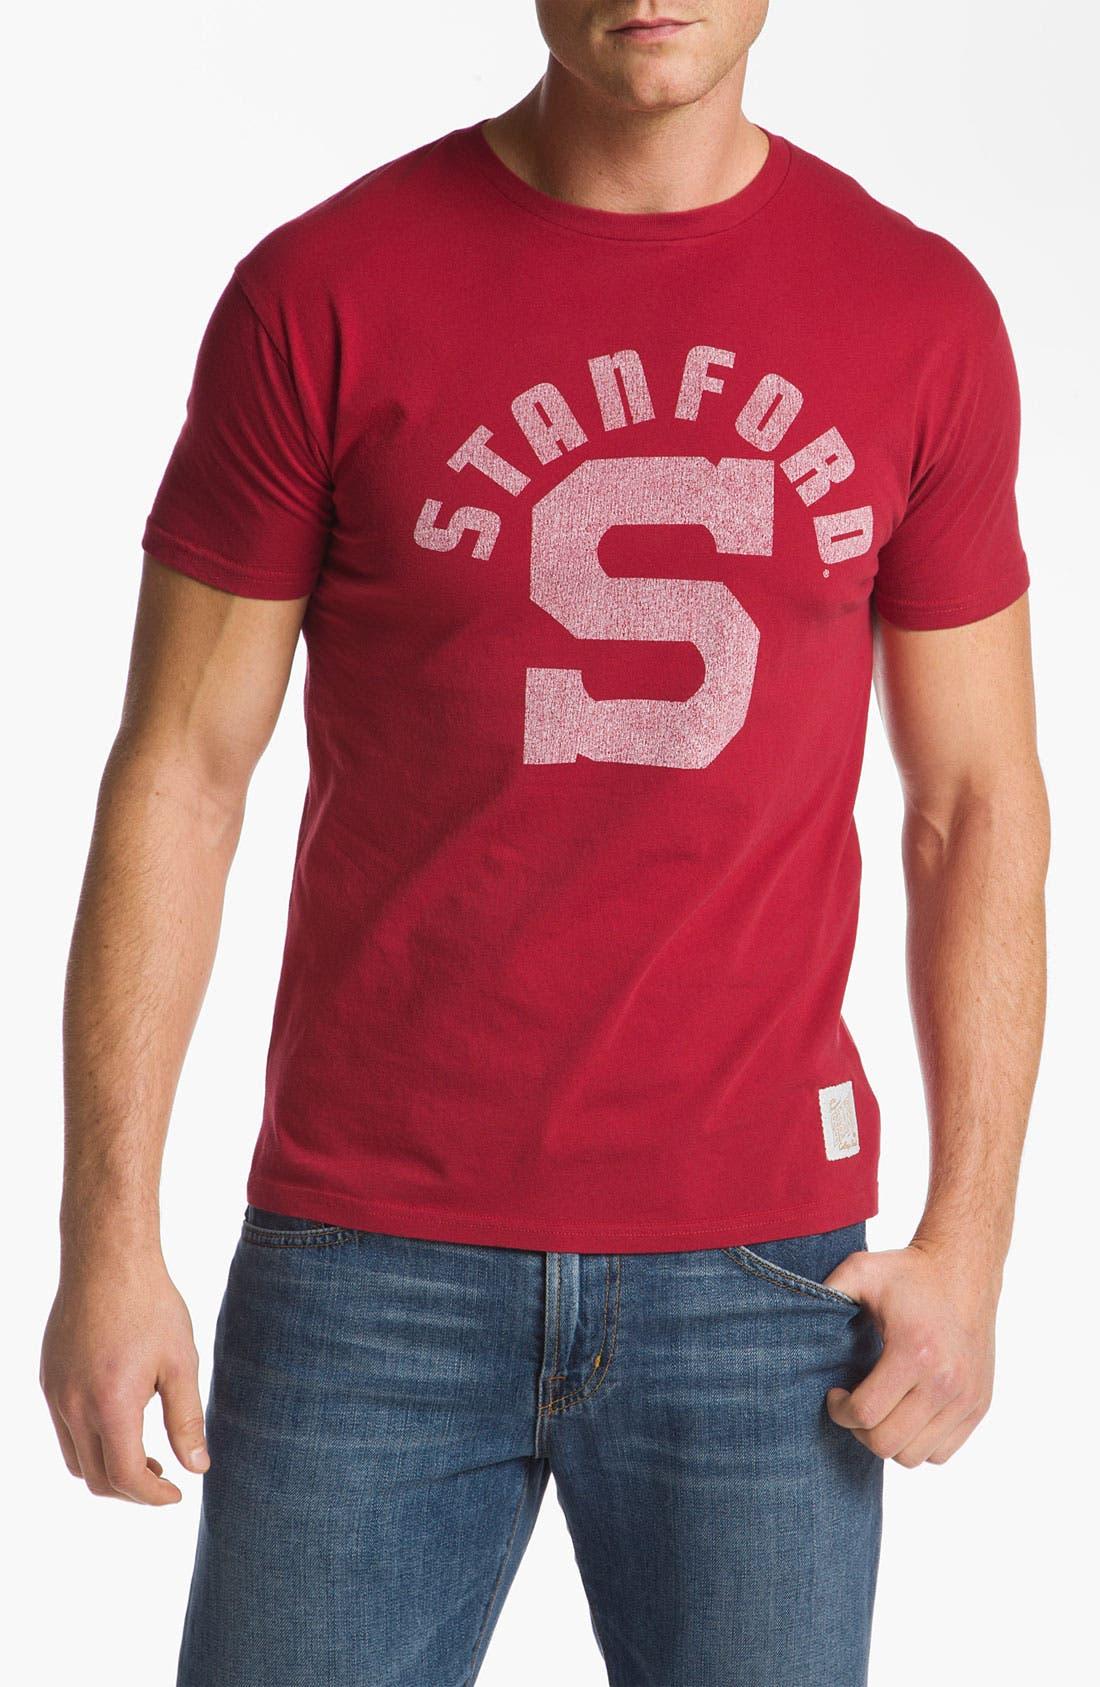 Alternate Image 1 Selected - The Original Retro Brand 'Stanford Cardinal' T-Shirt